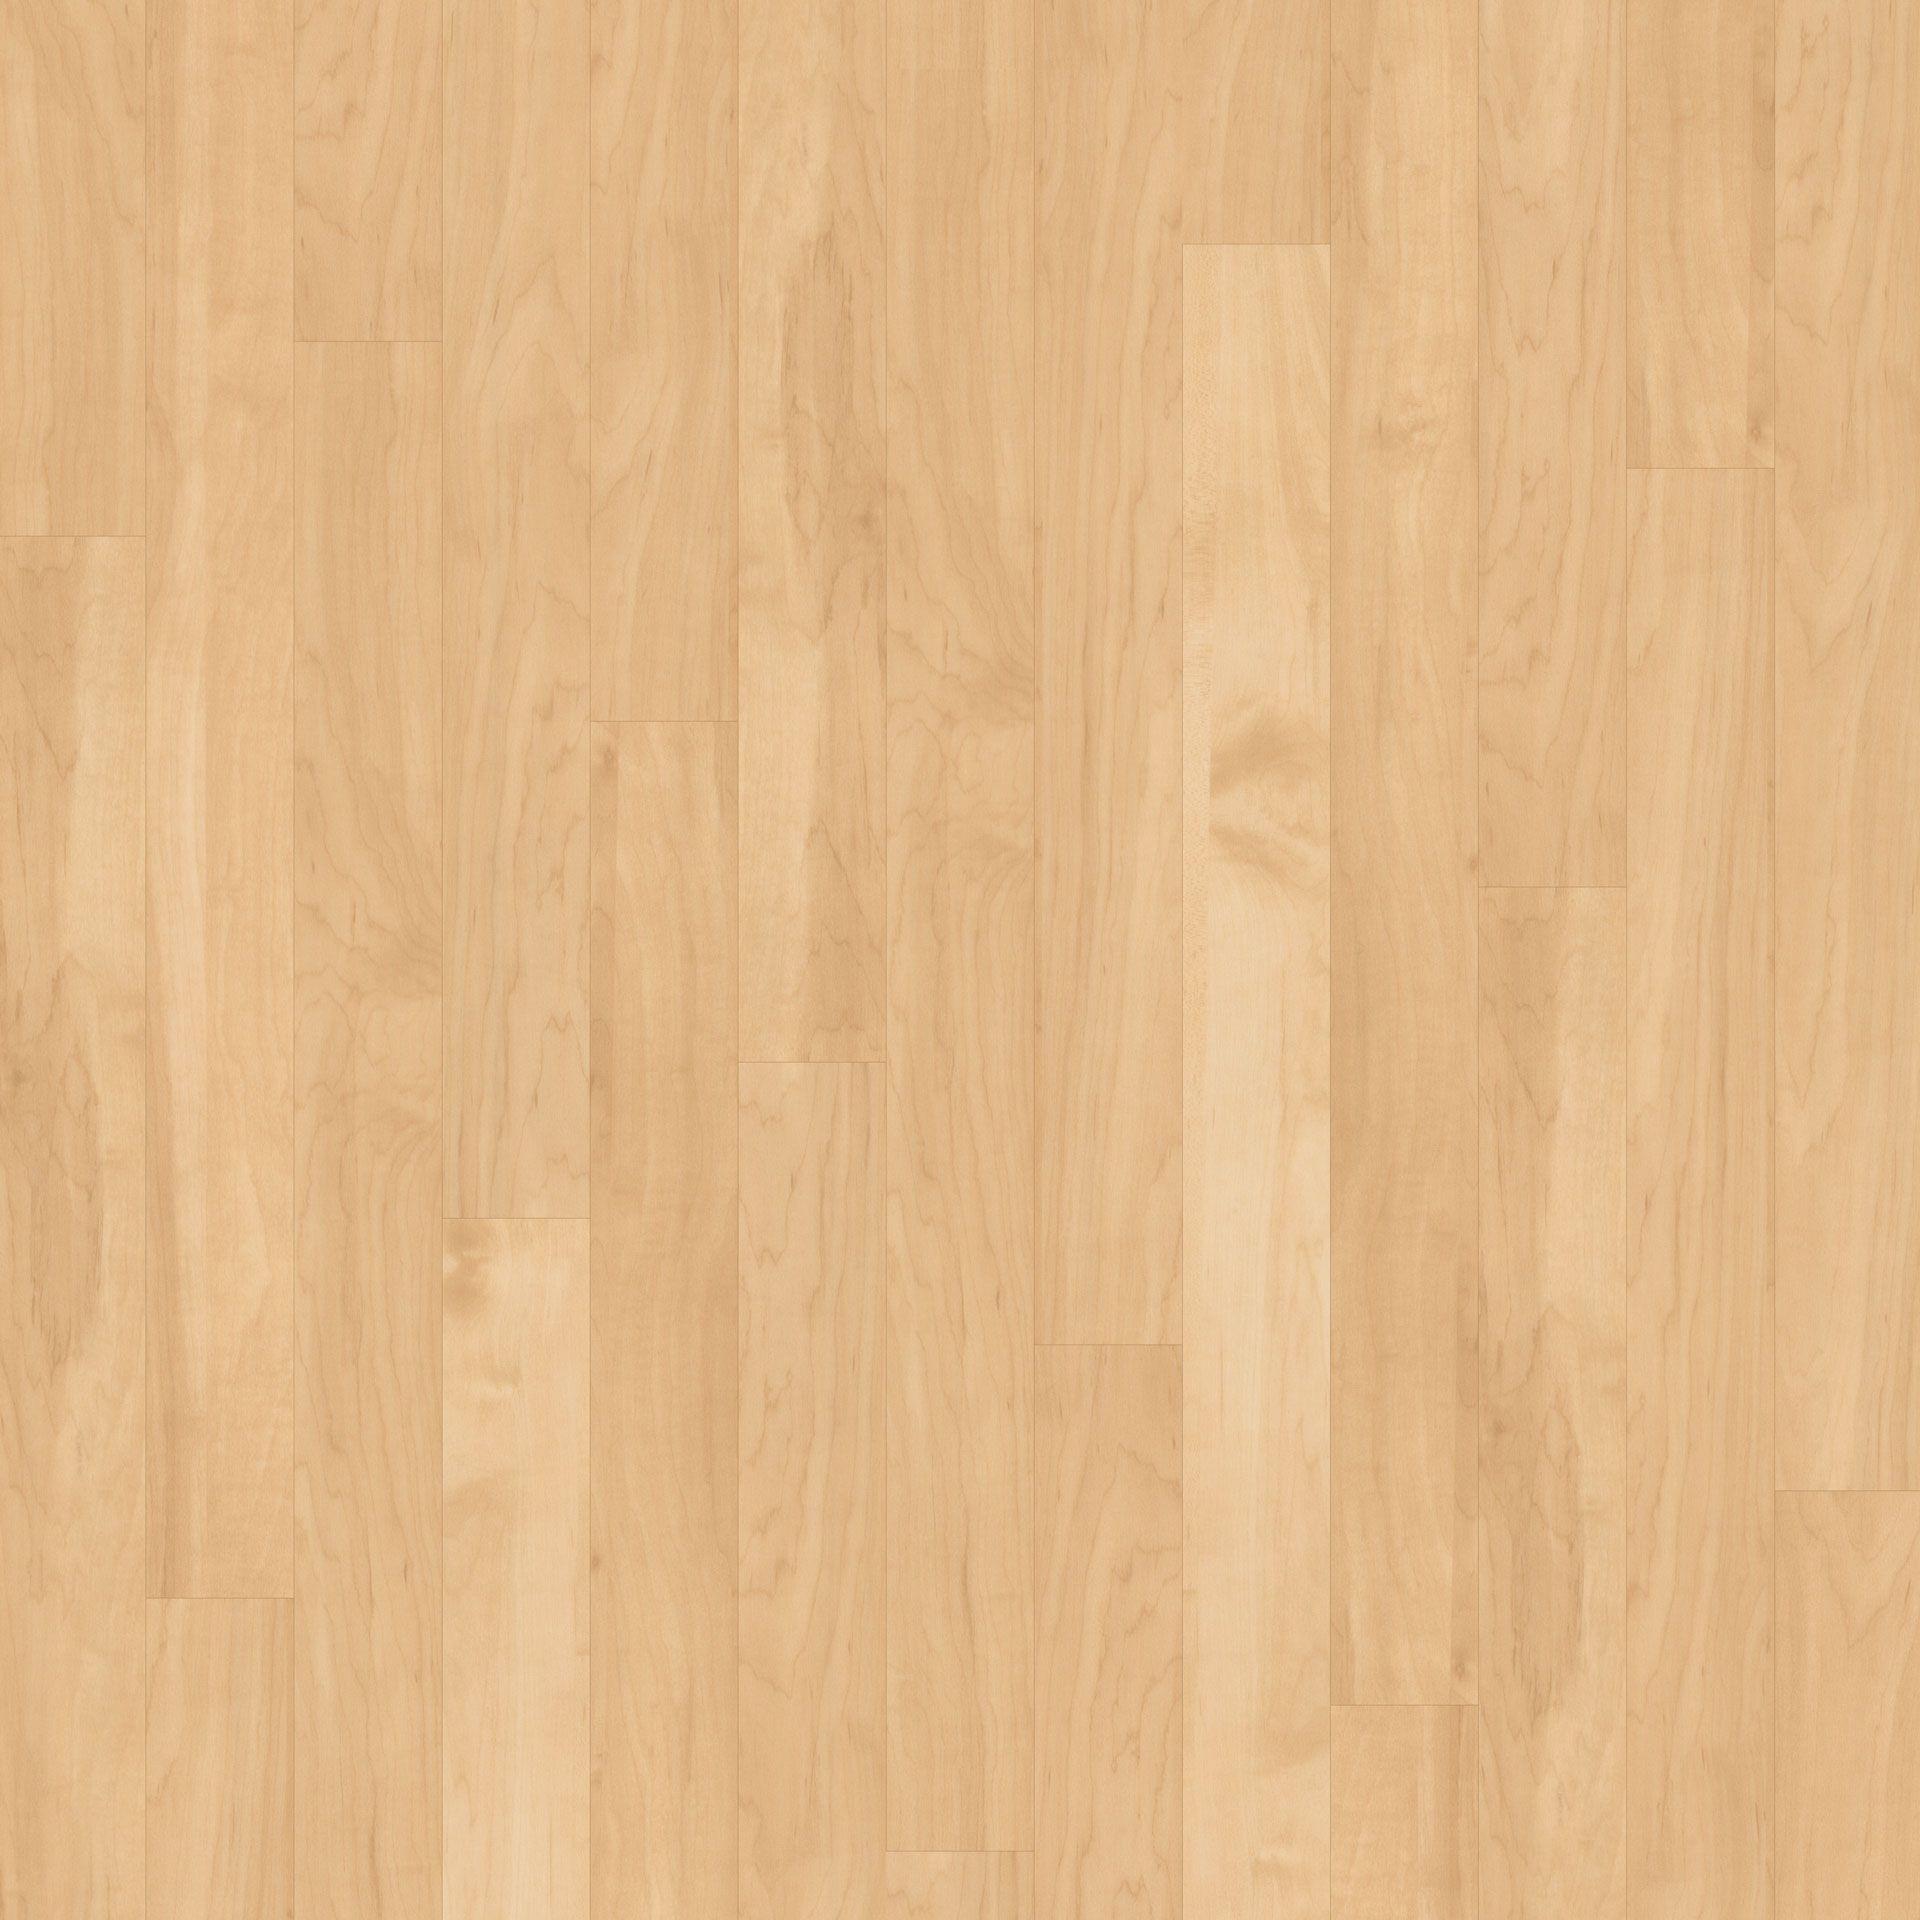 RP61 Canadian Maple Da Vinci Vinyl flooring kitchen